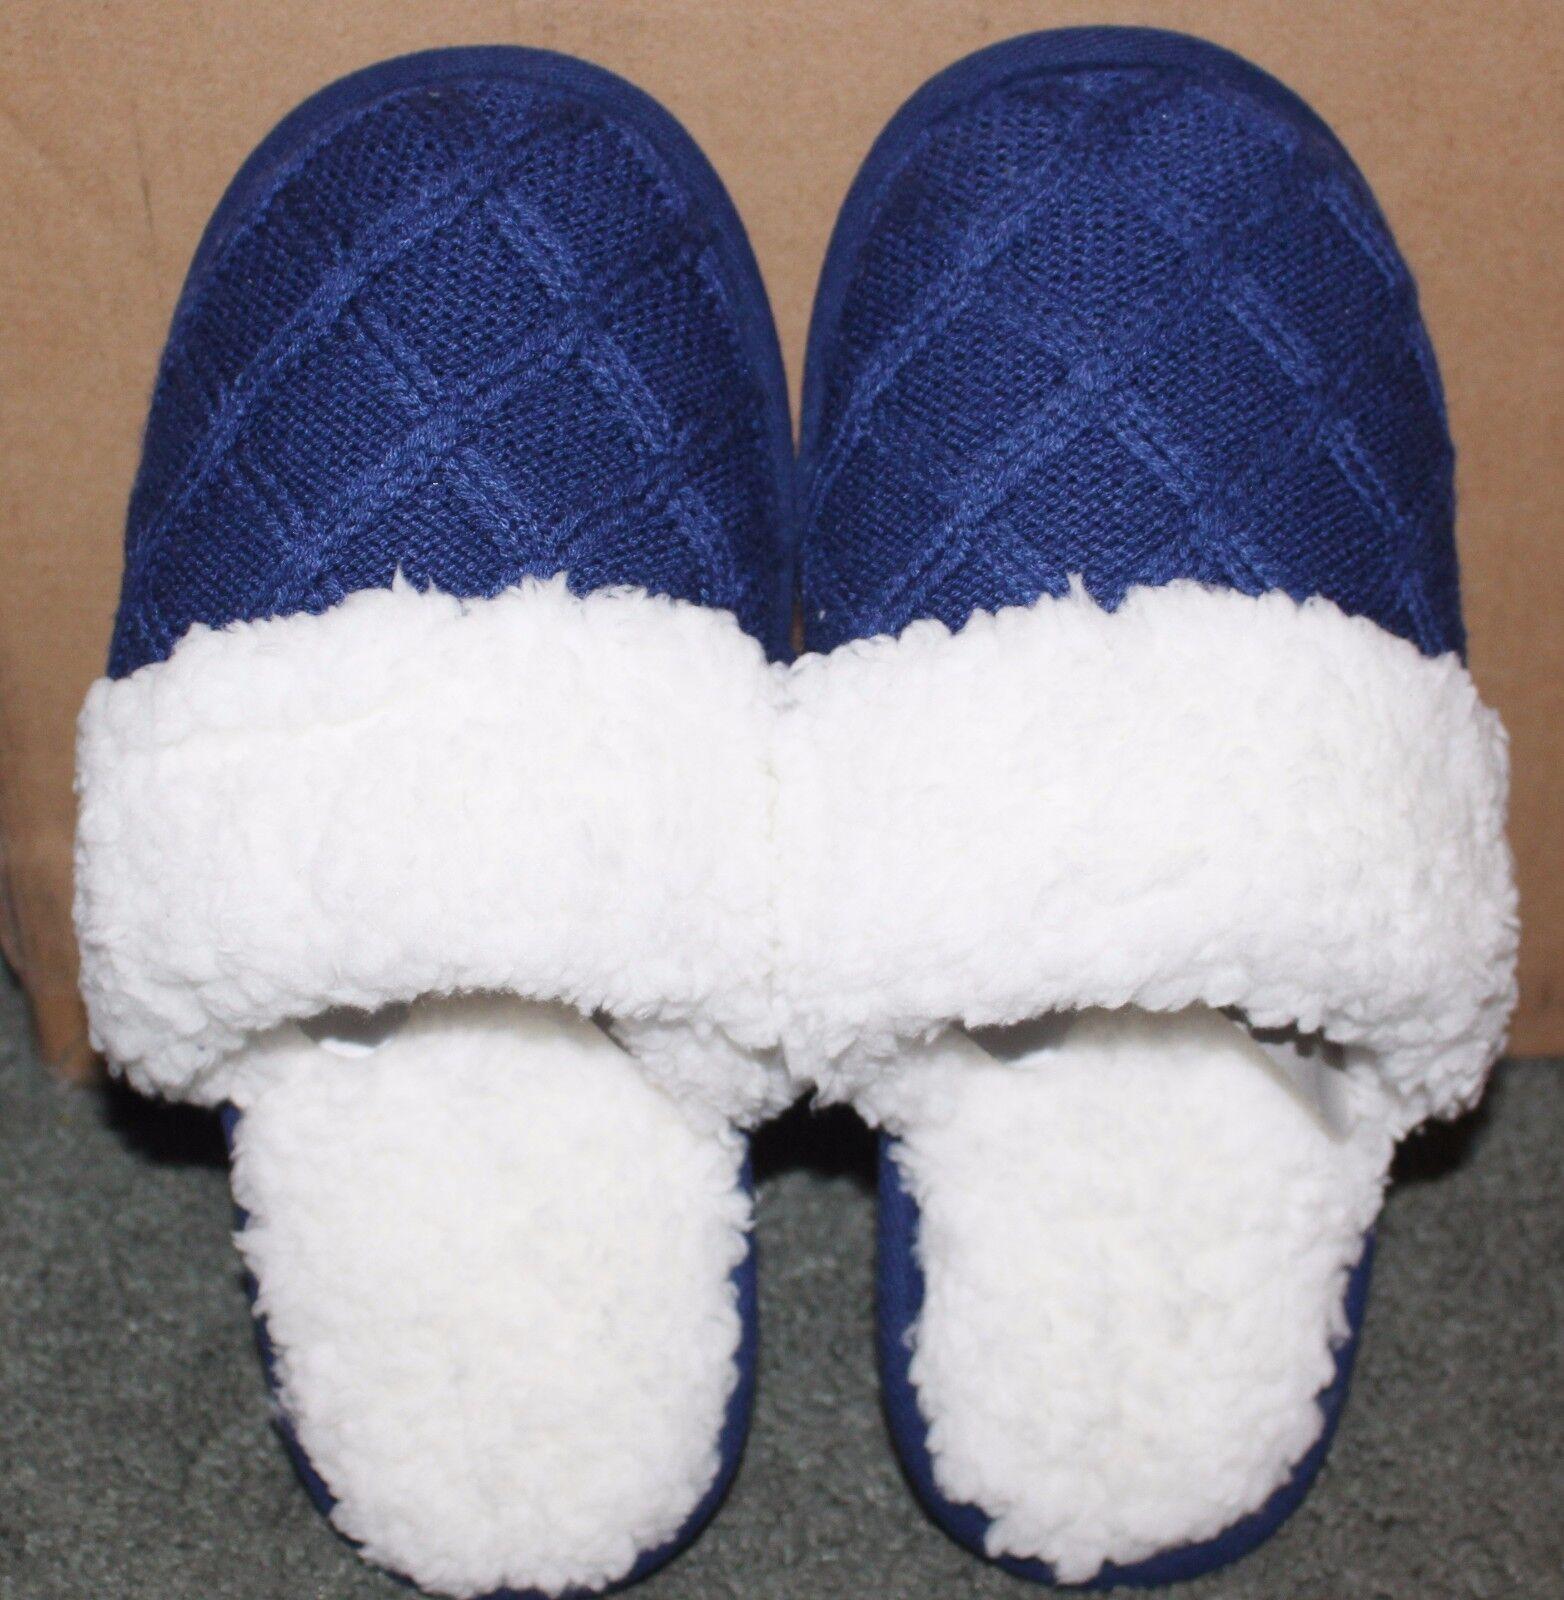 Victoria's Secret Super Soft Blue Waffle Slippers NEW Medium M 7 8 HS3